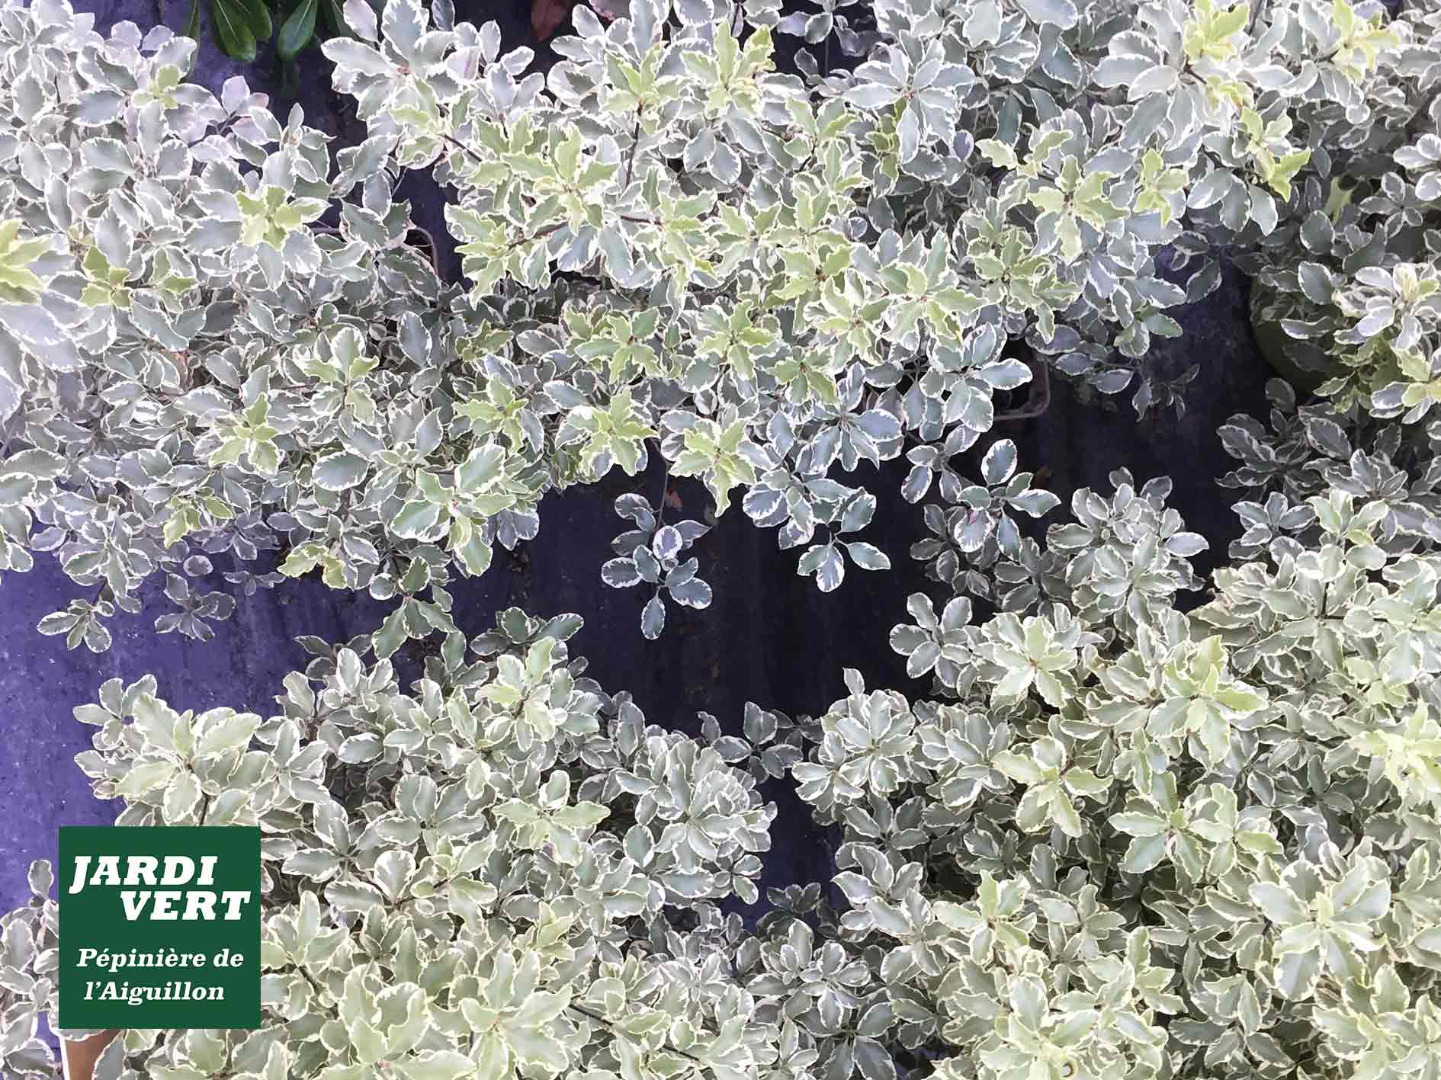 Vente de Pittospore (pittosporum tenuifolium) - Jardinerie de l'Aiguillon Toulouse